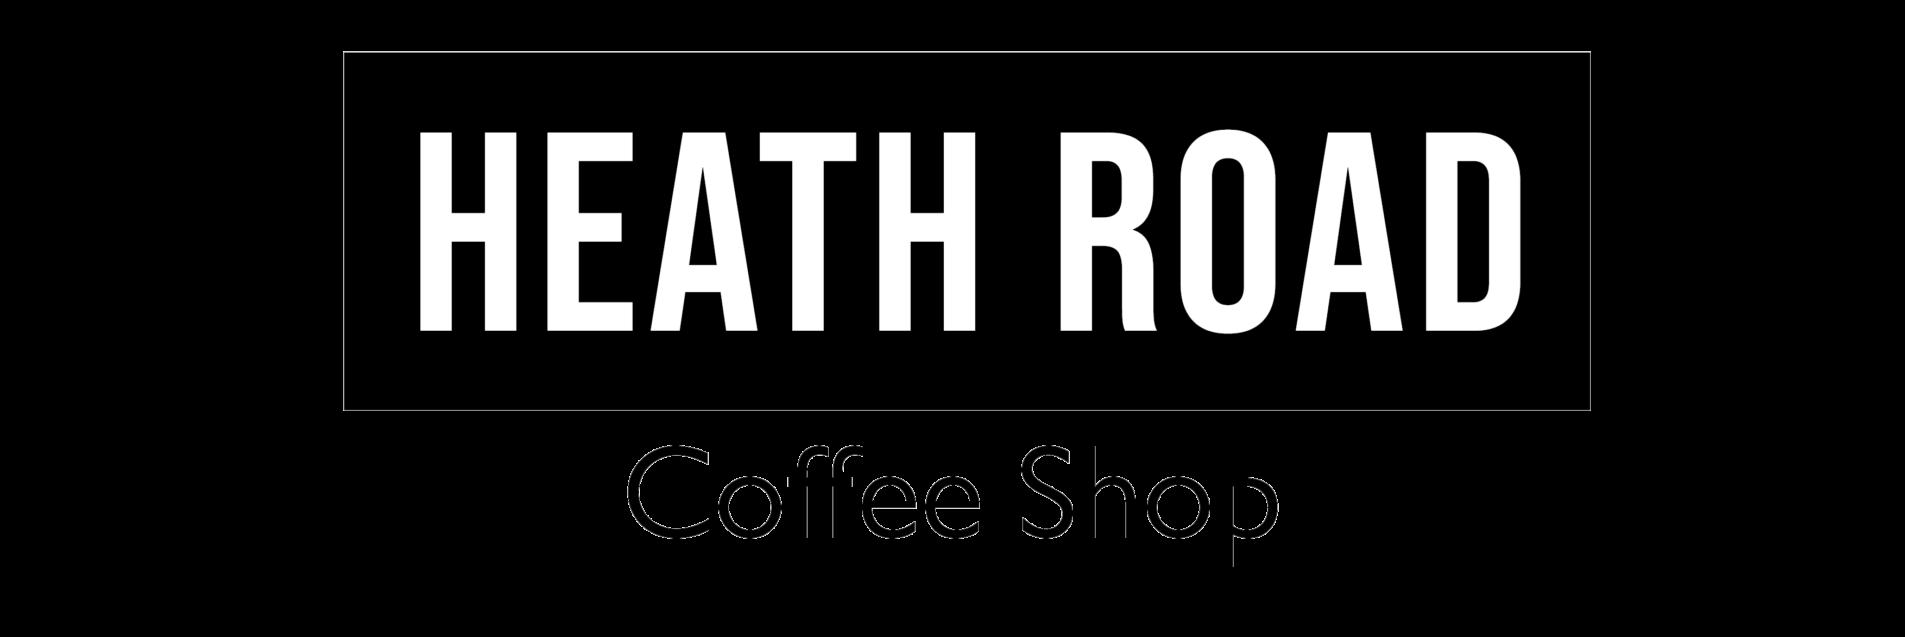 Heath Road Coffee Shop Opening Times